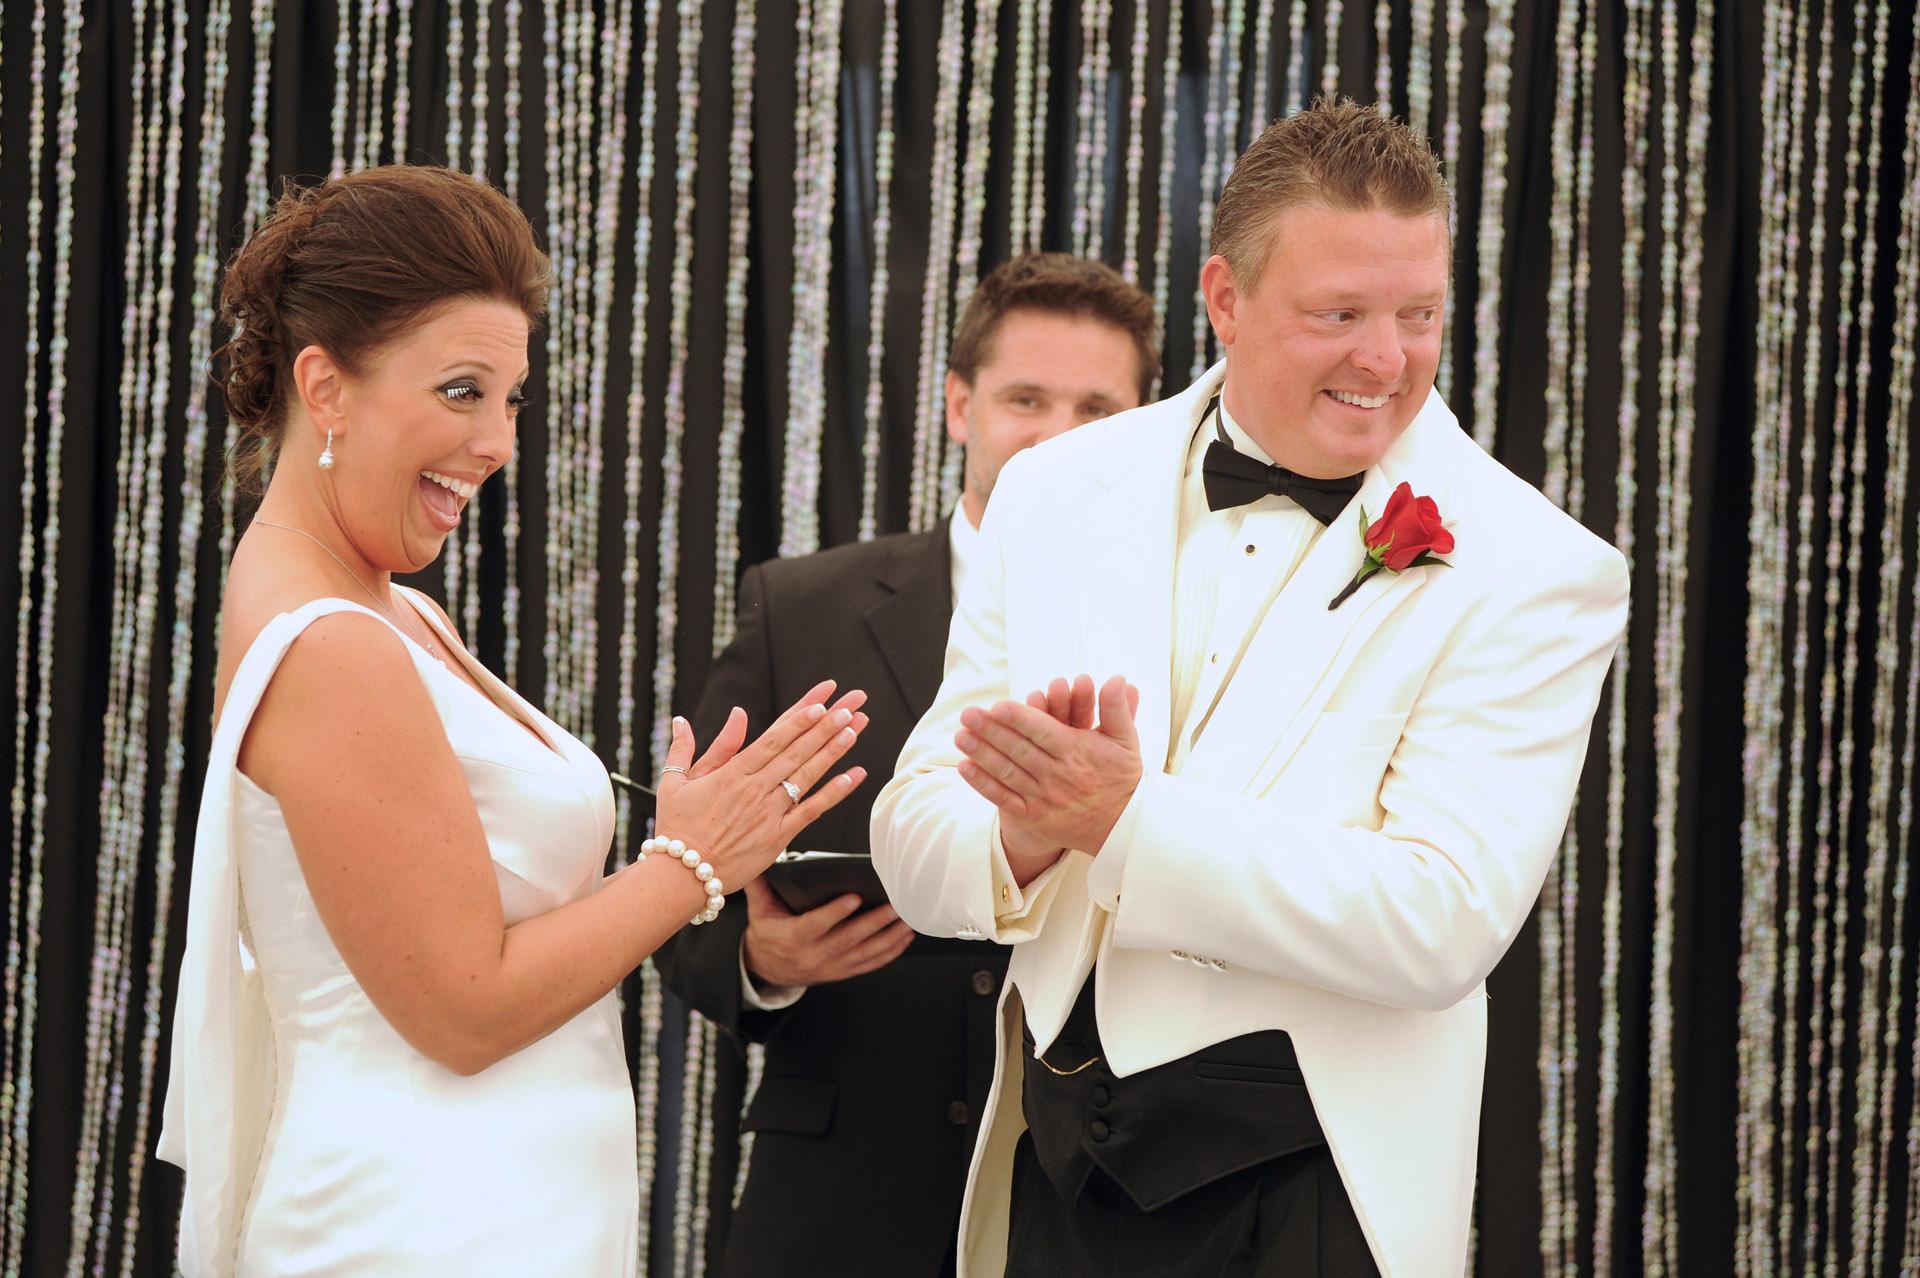 Birmingham Michigans The Reserve Hosts A 20s Themed Wedding